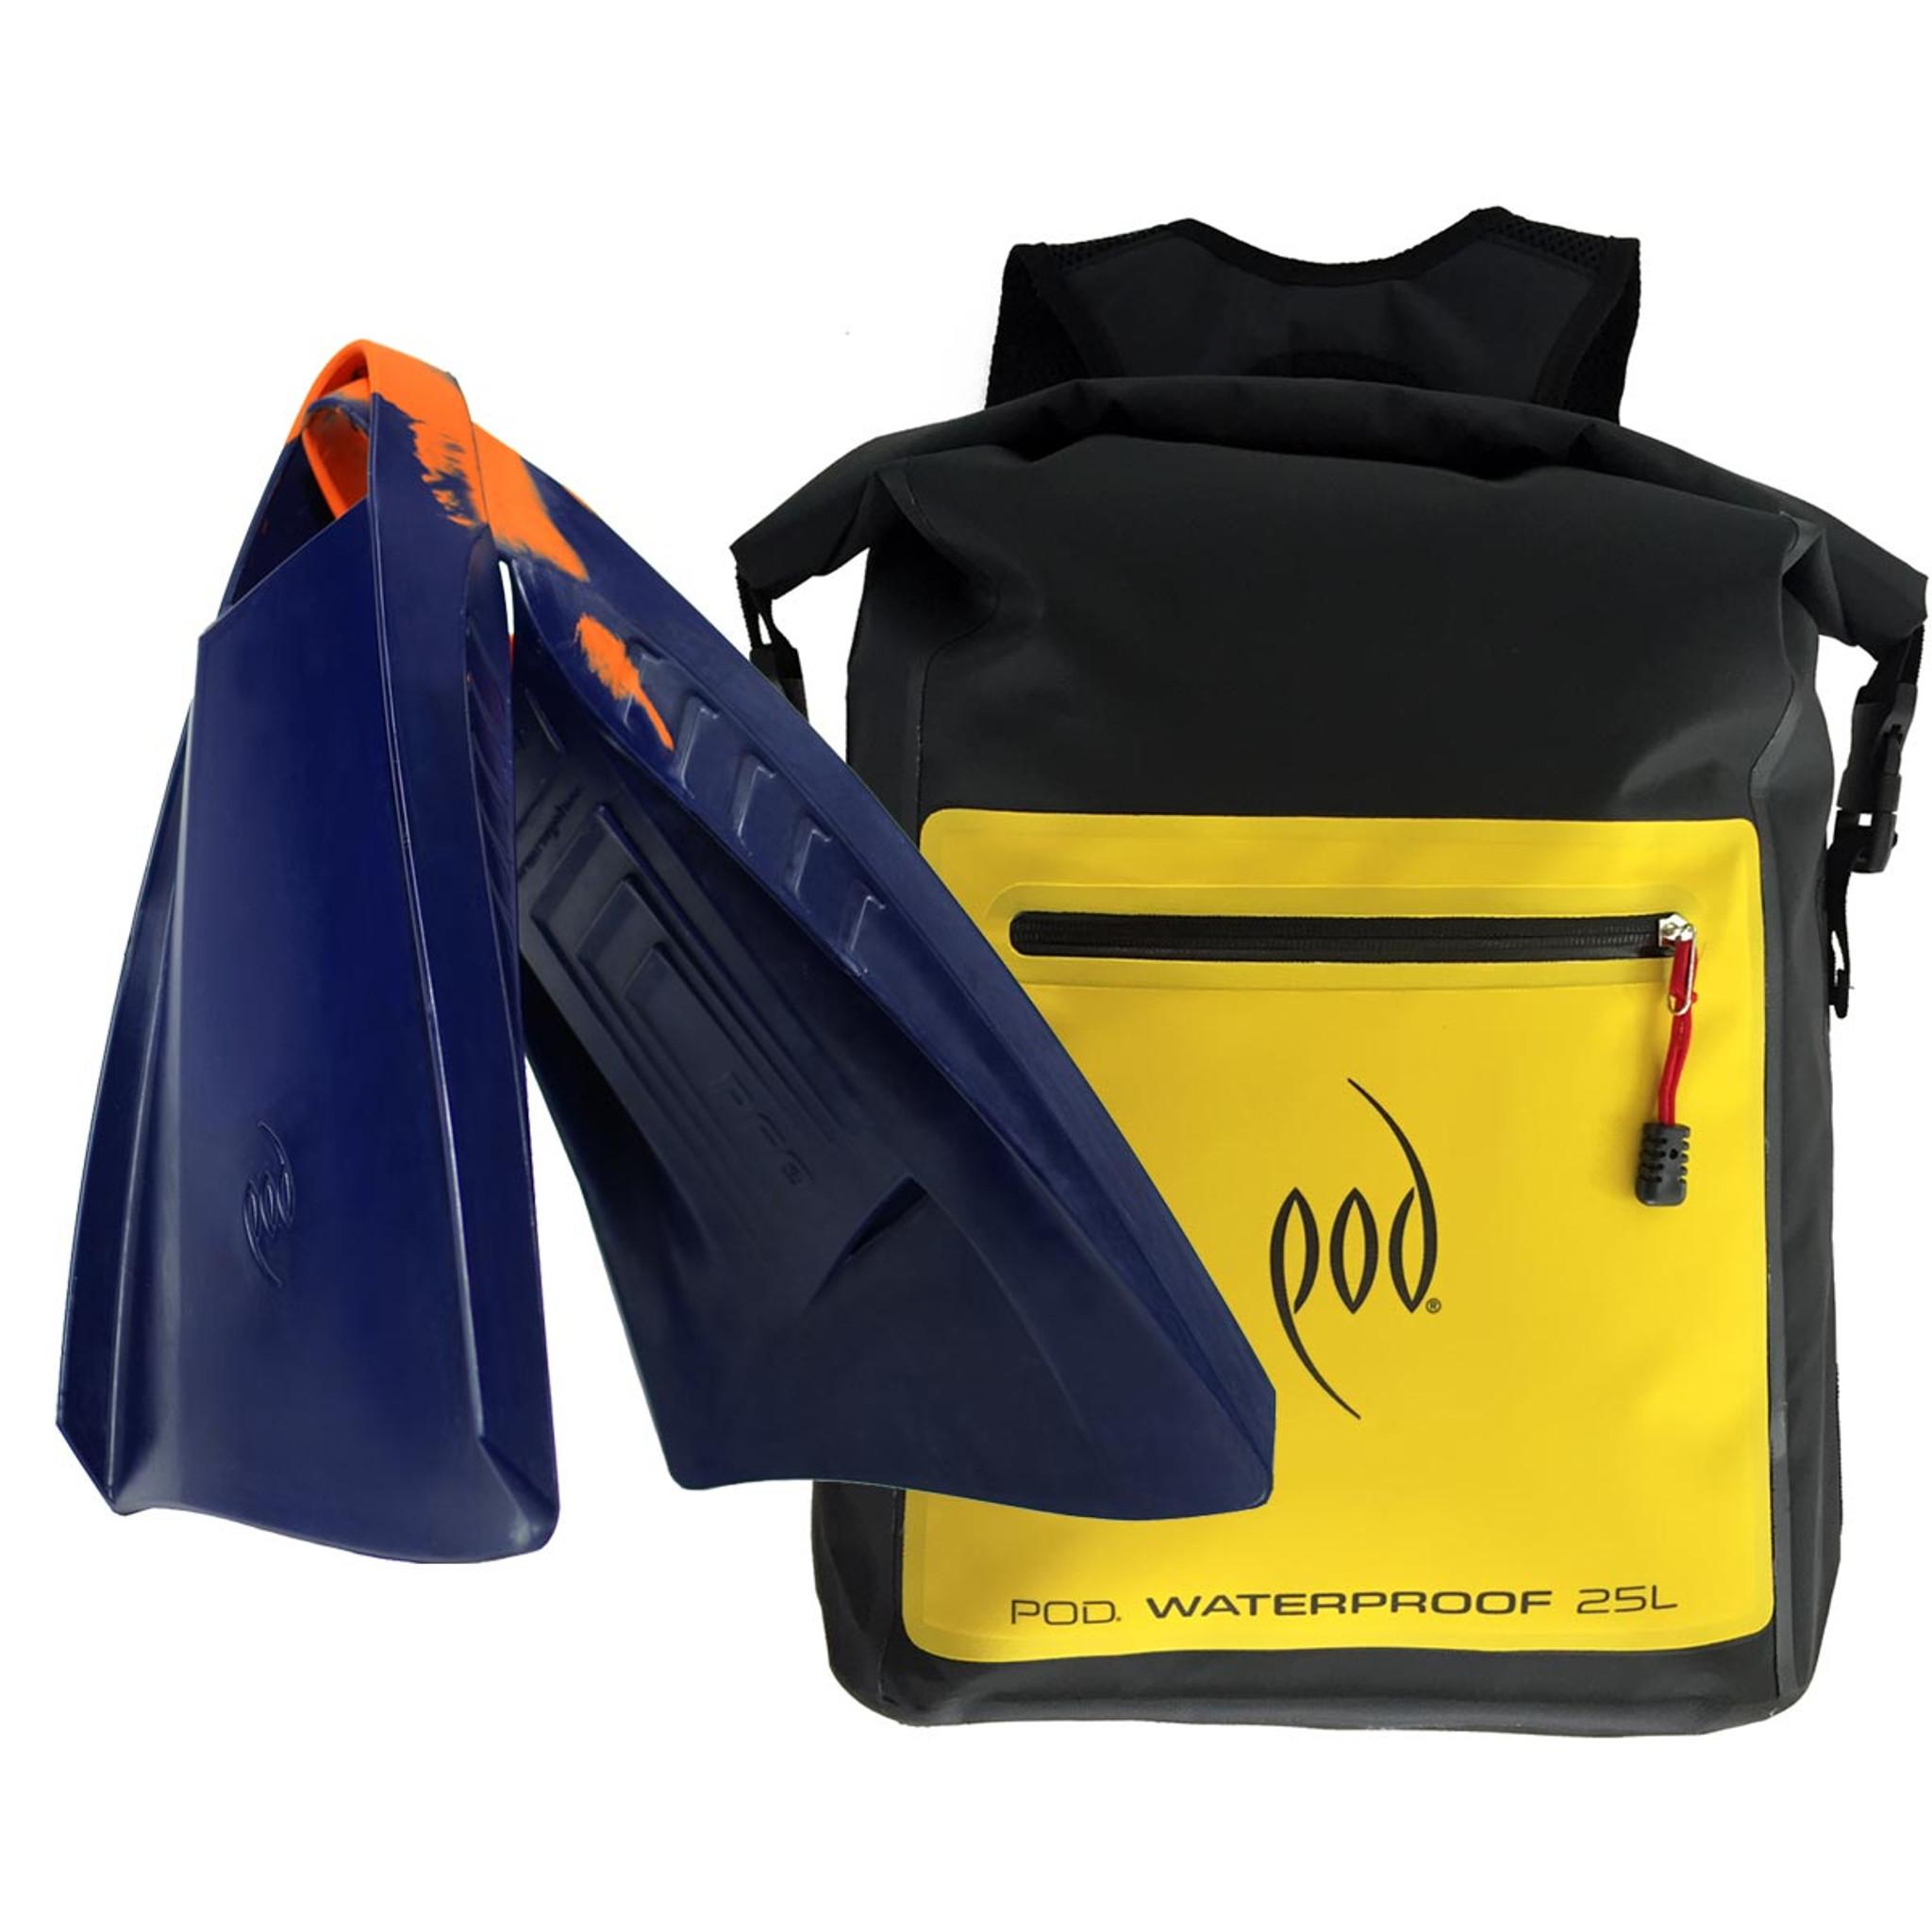 Waterproof Backpack 25 Litres - POD Fins PF3 - Swim Fins